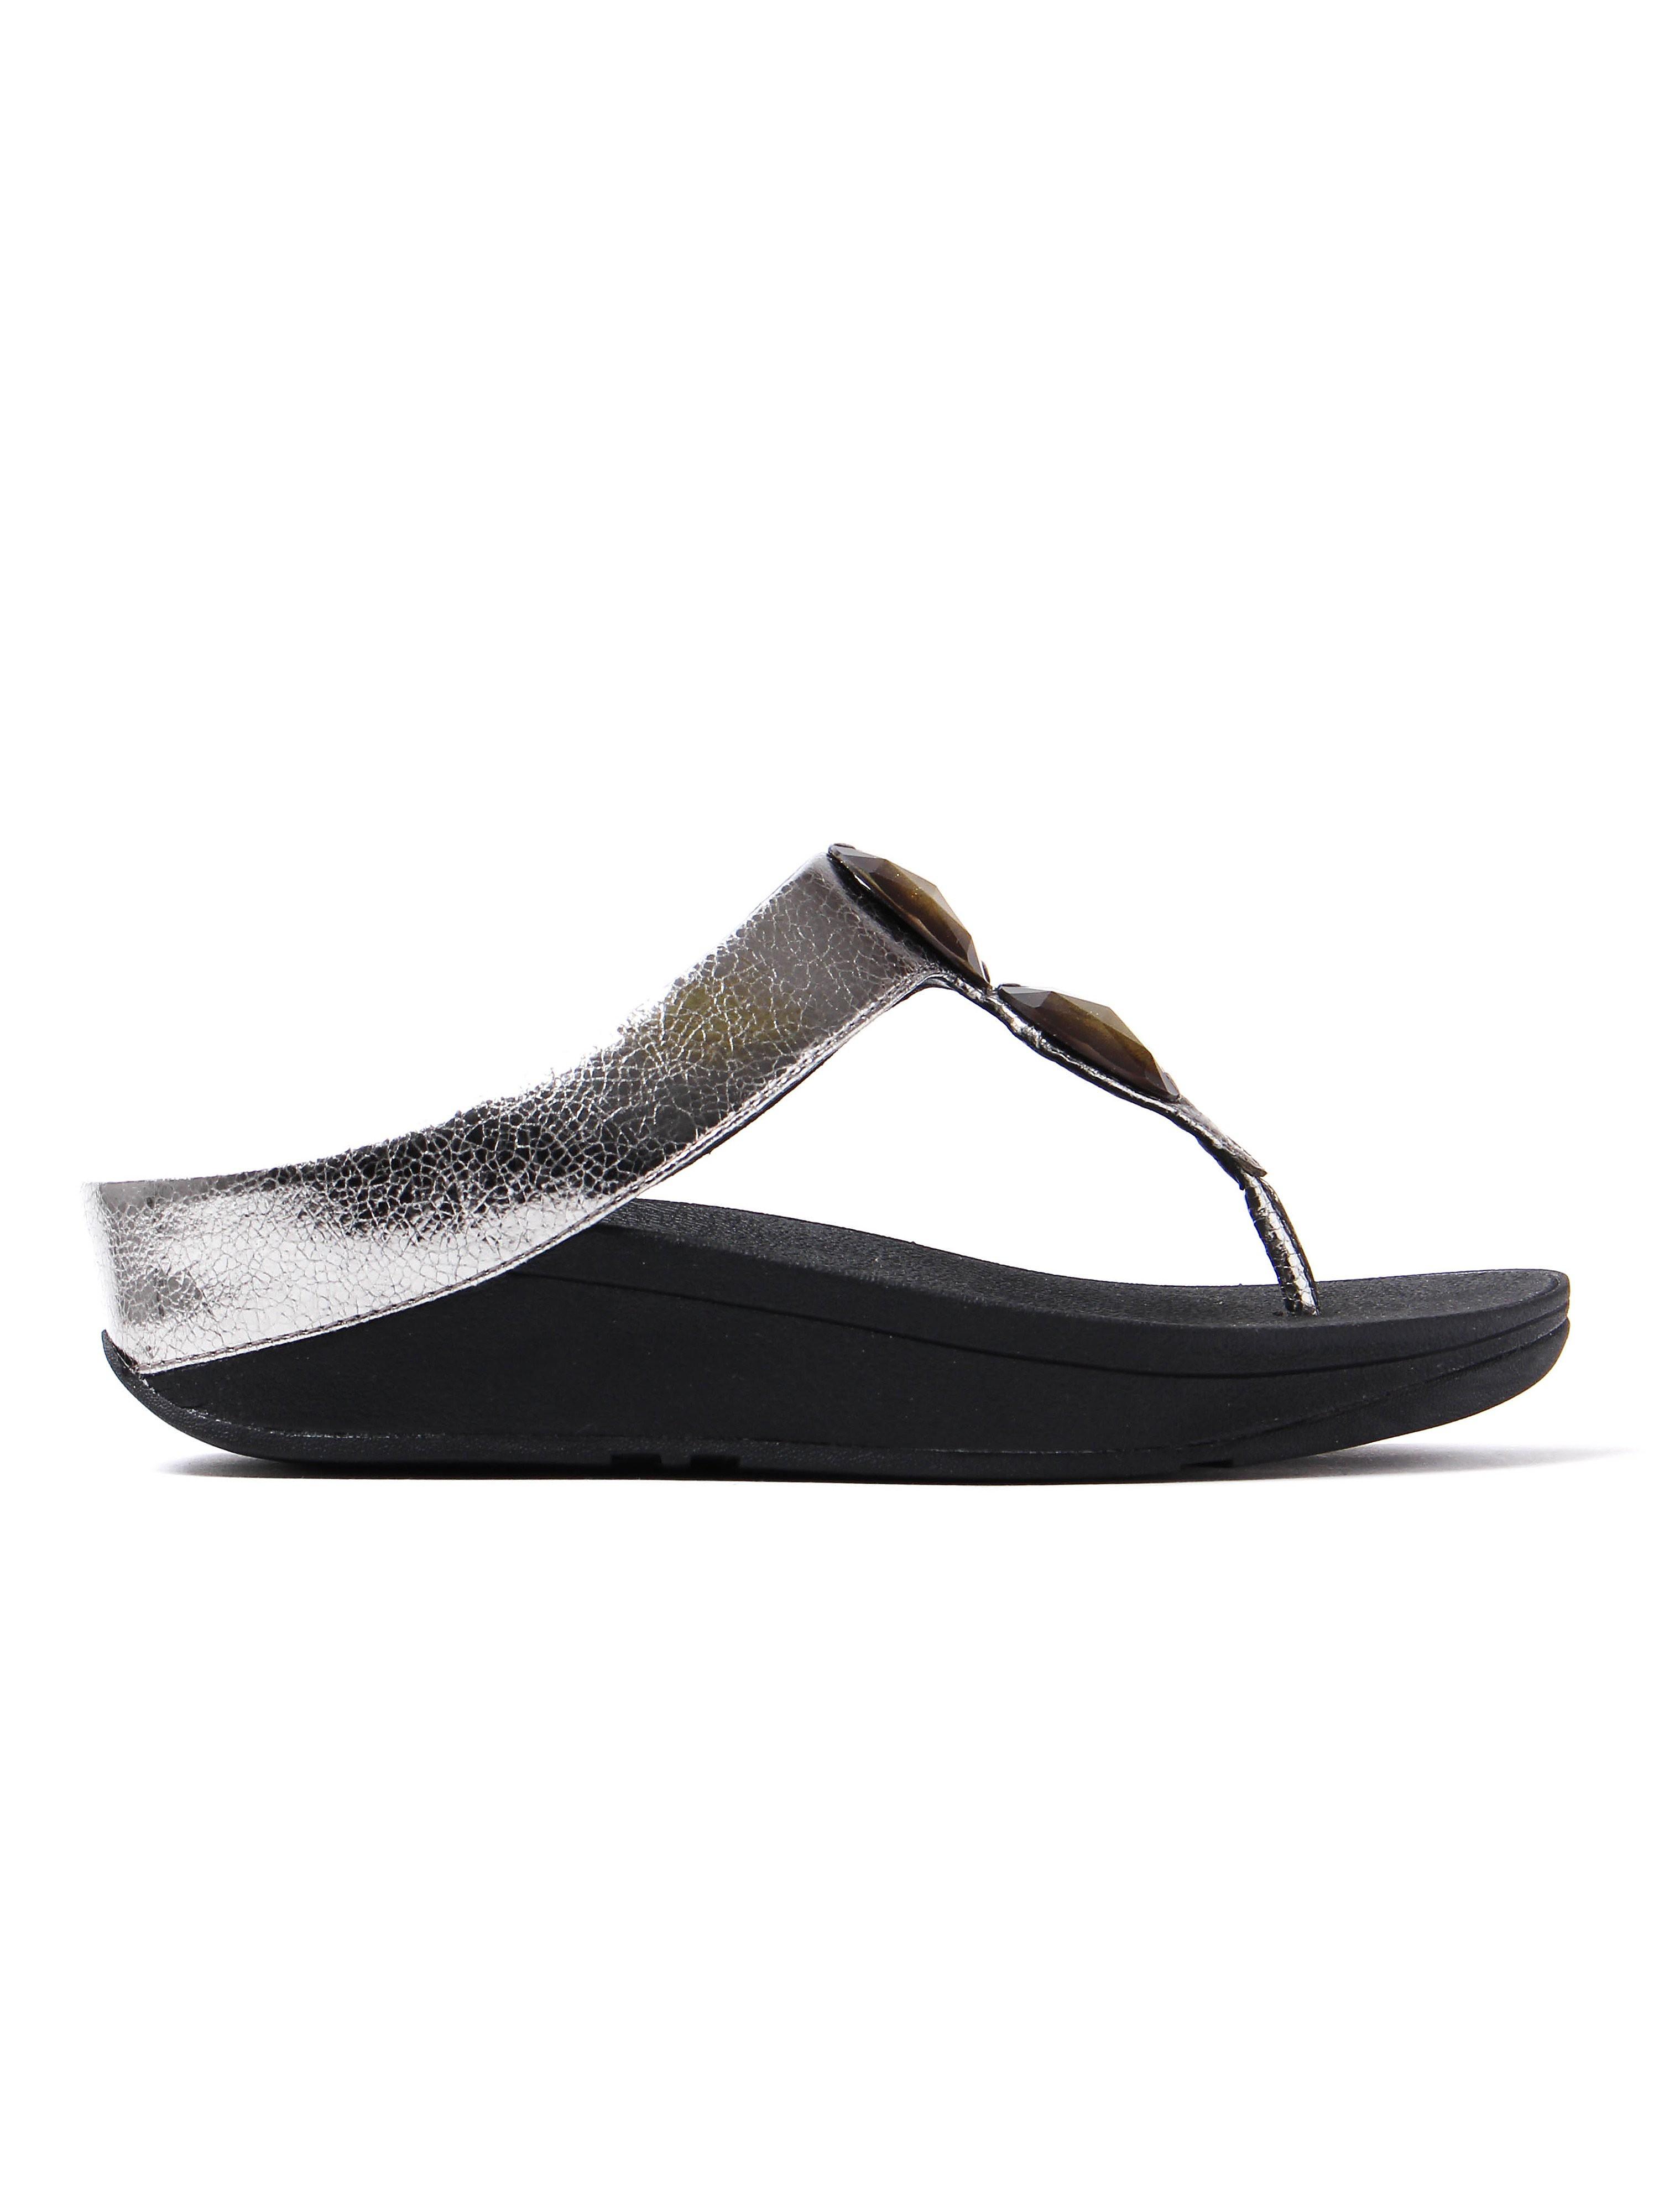 FitFlop Women's Pierra Leather Toe-Post Sandals - Pewter